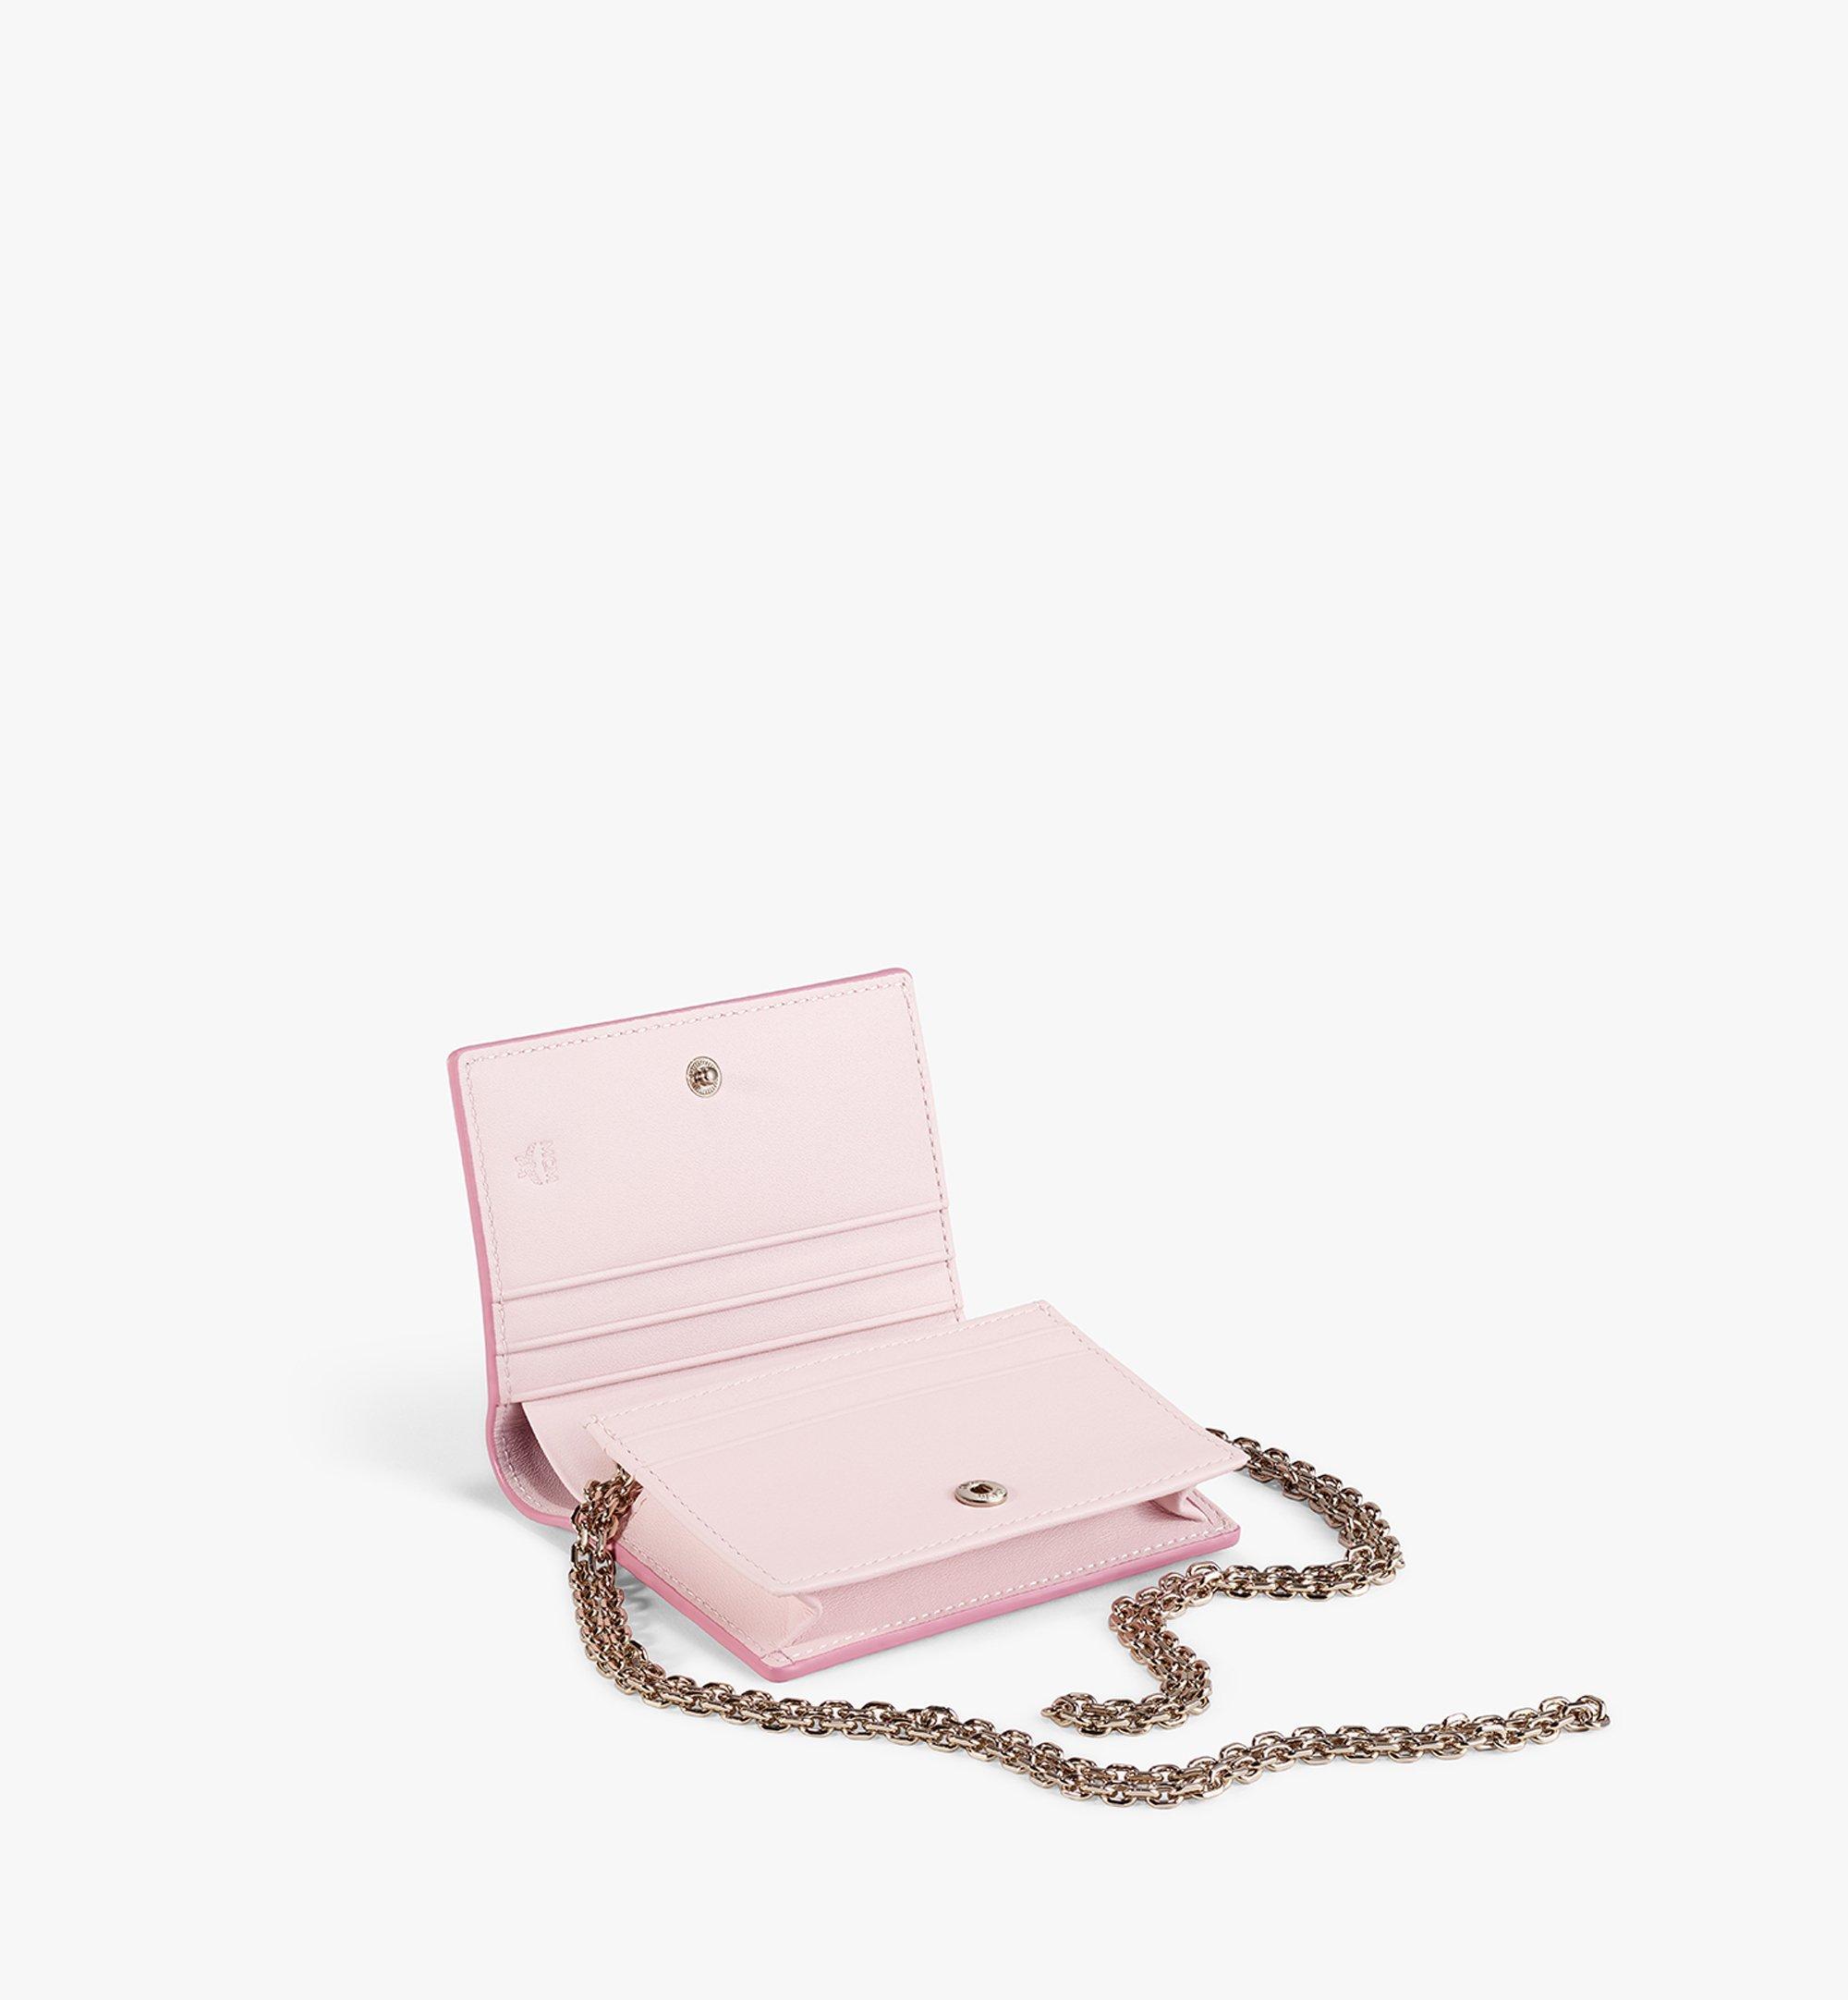 MCM Visetos Original链带钱包 Pink MYLAAVI02QH001 更多视角 1